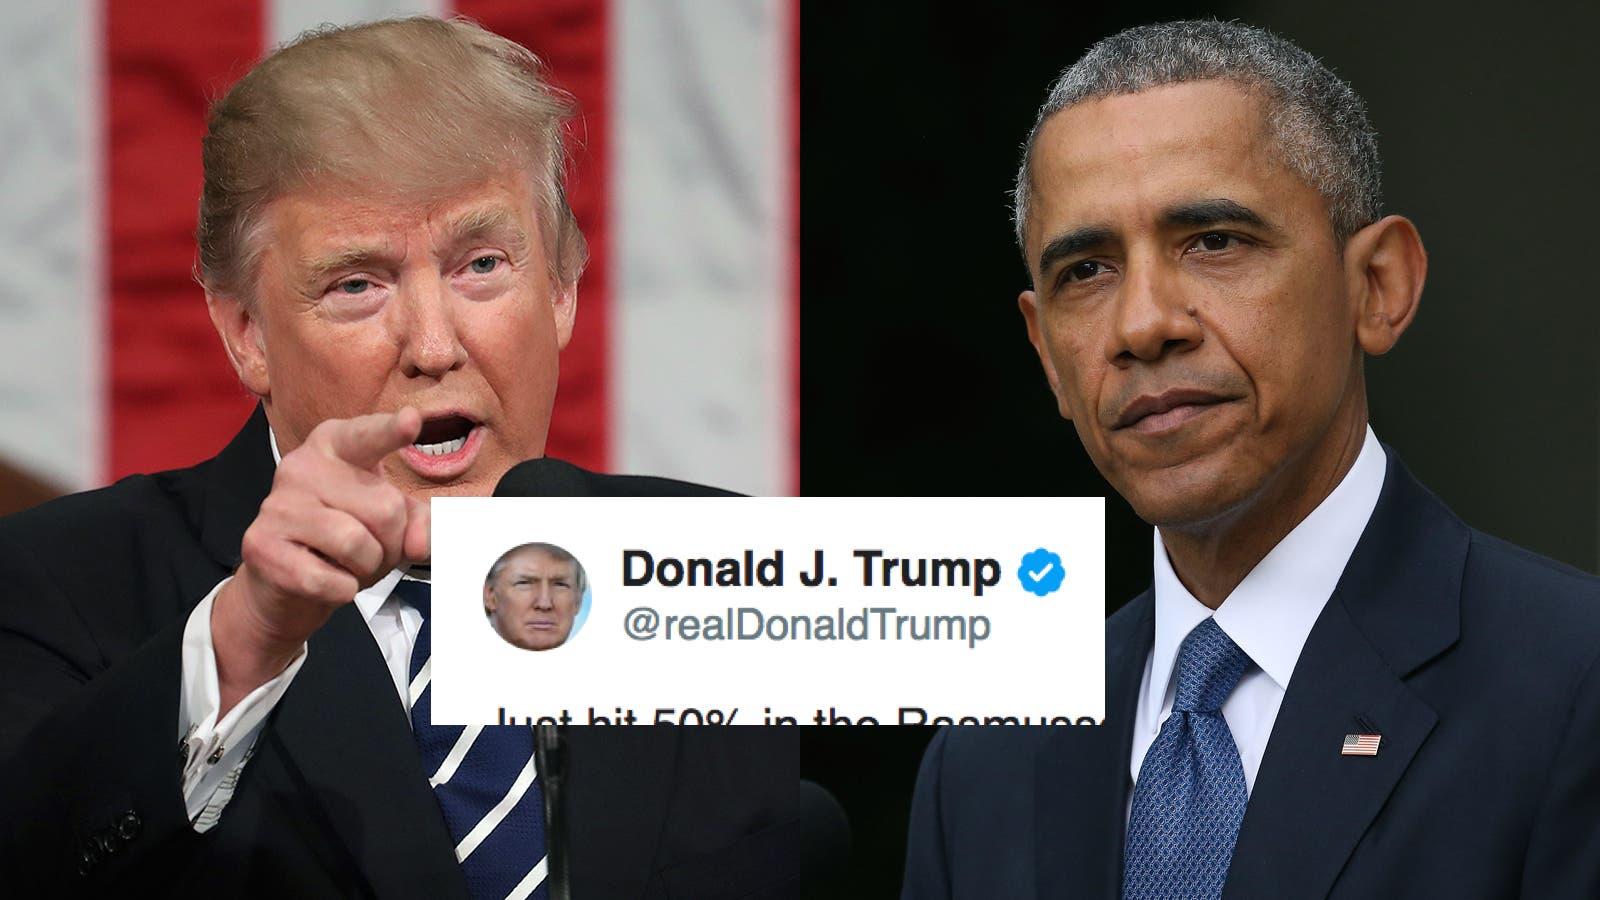 Trump just took an unprovoked swipe at Obama in self-congratulatory tweet